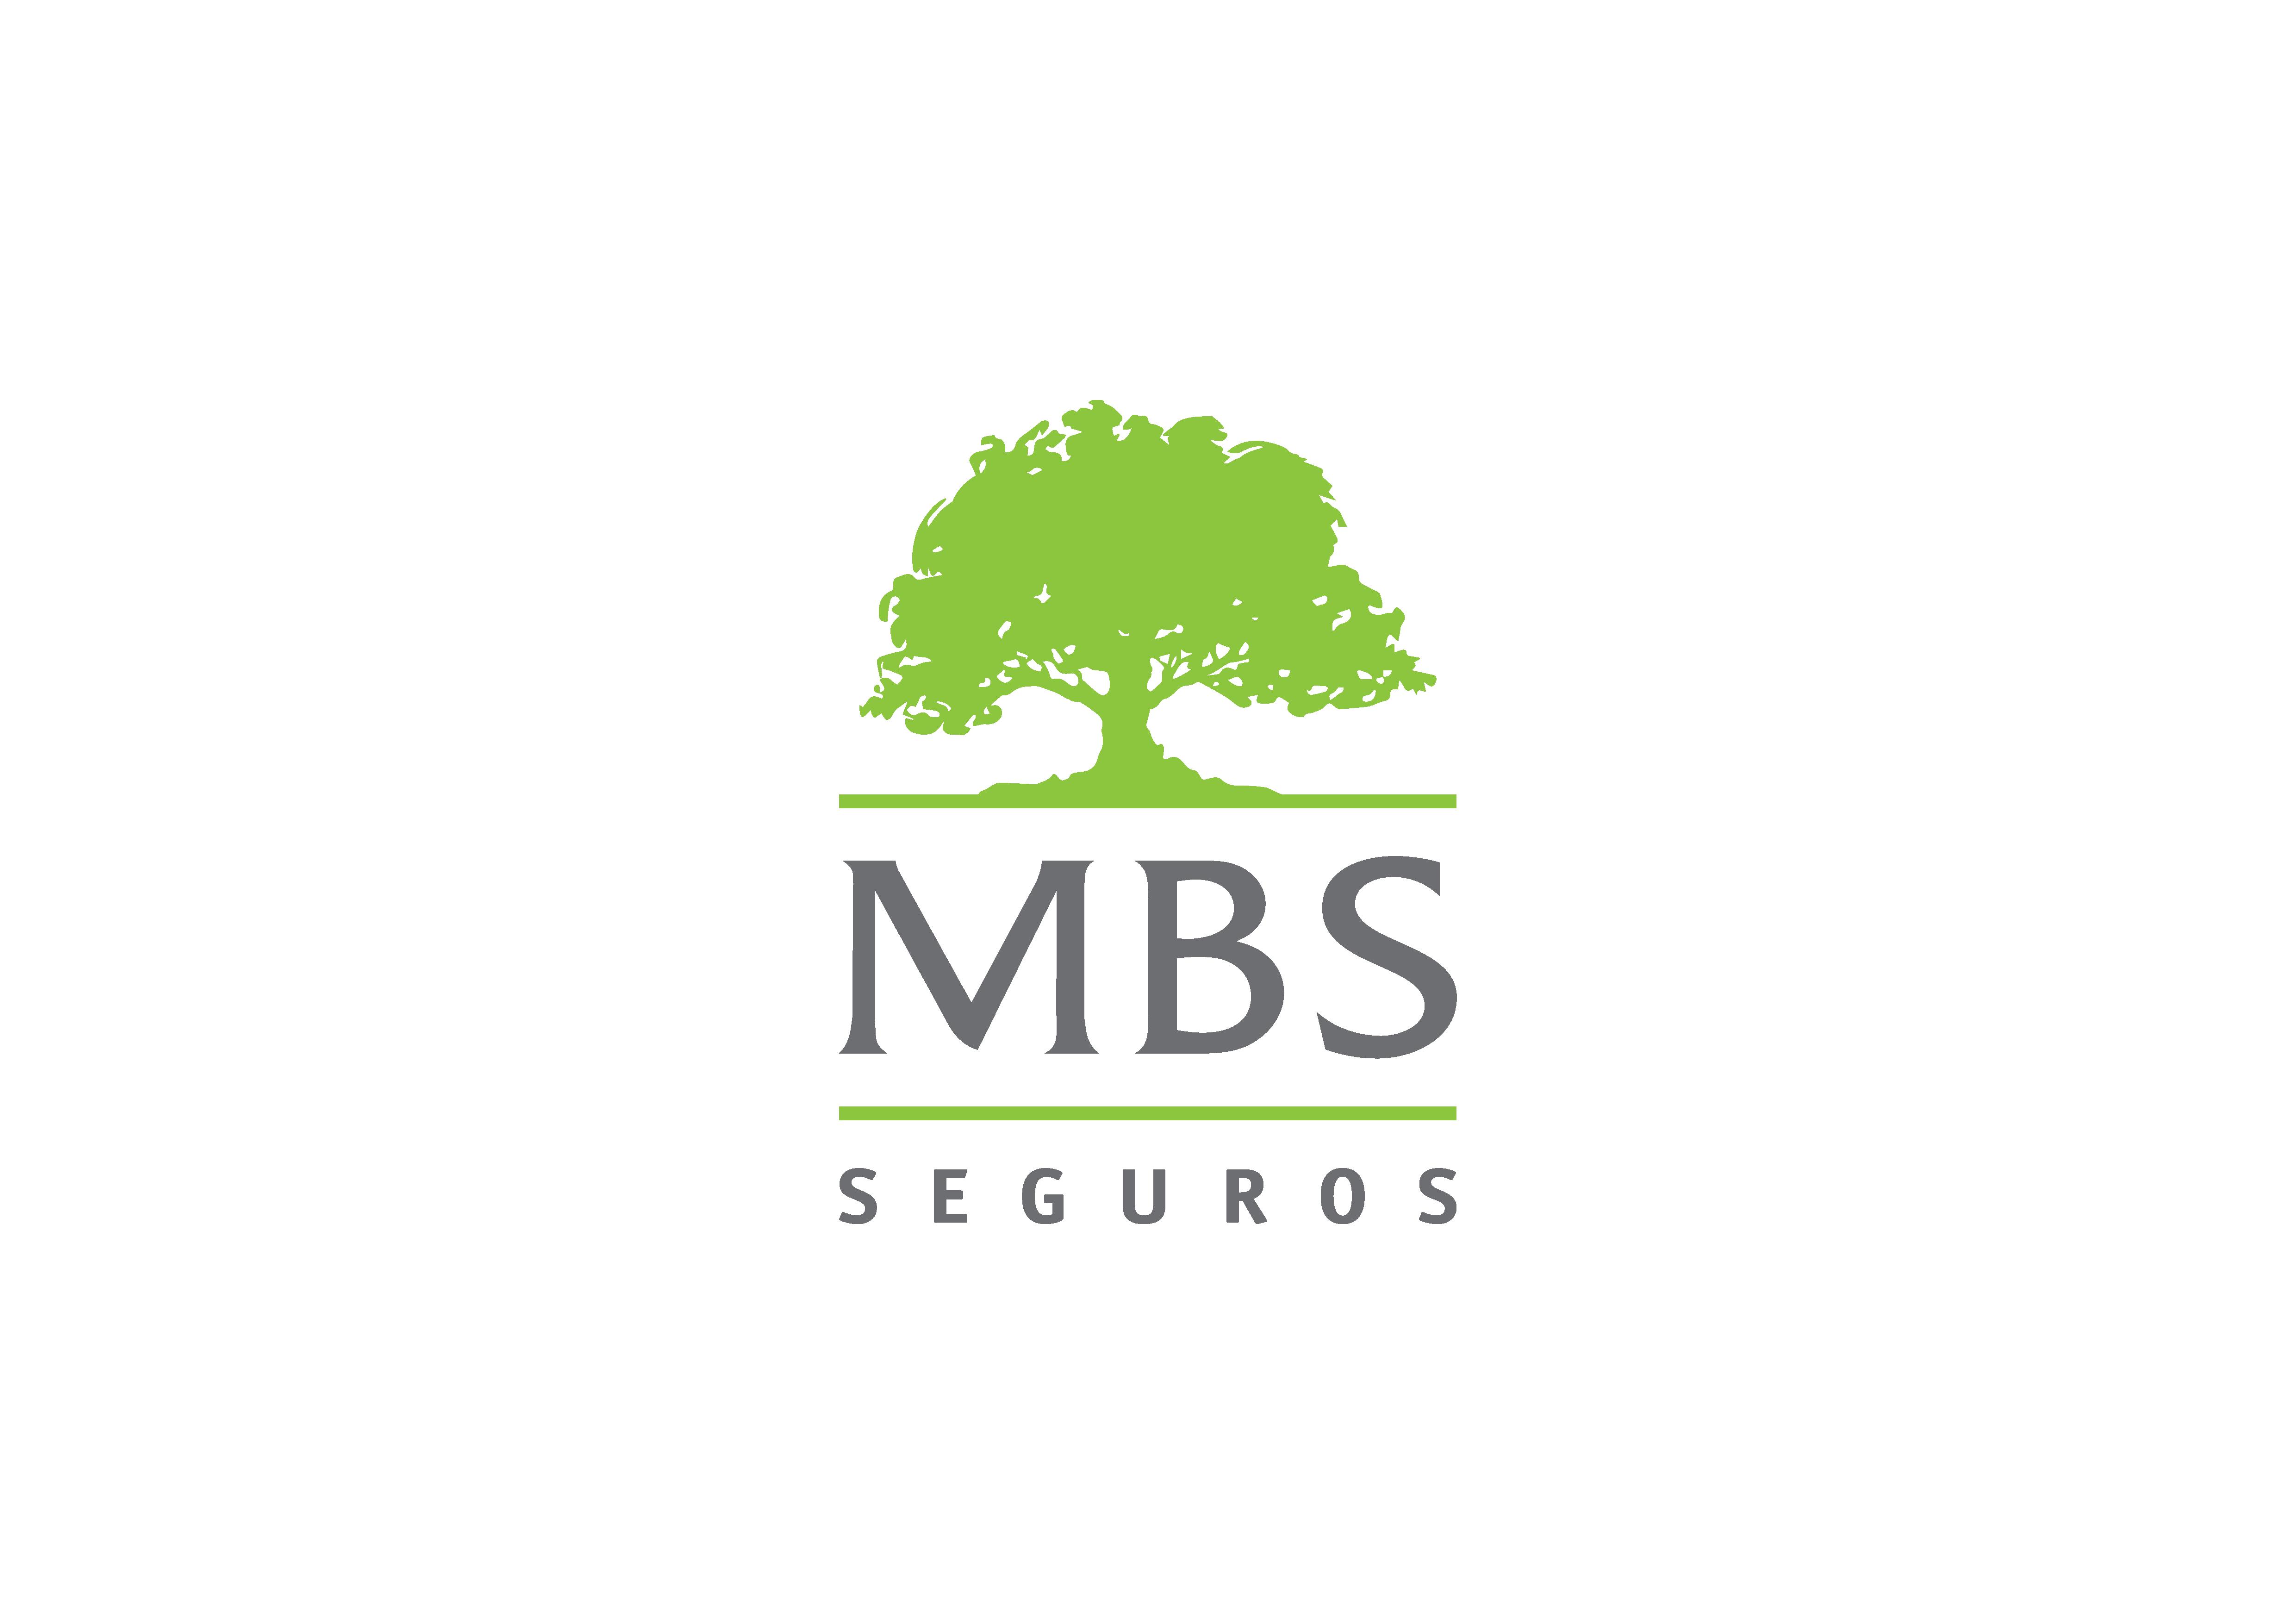 MBS SEGUROS - 3389